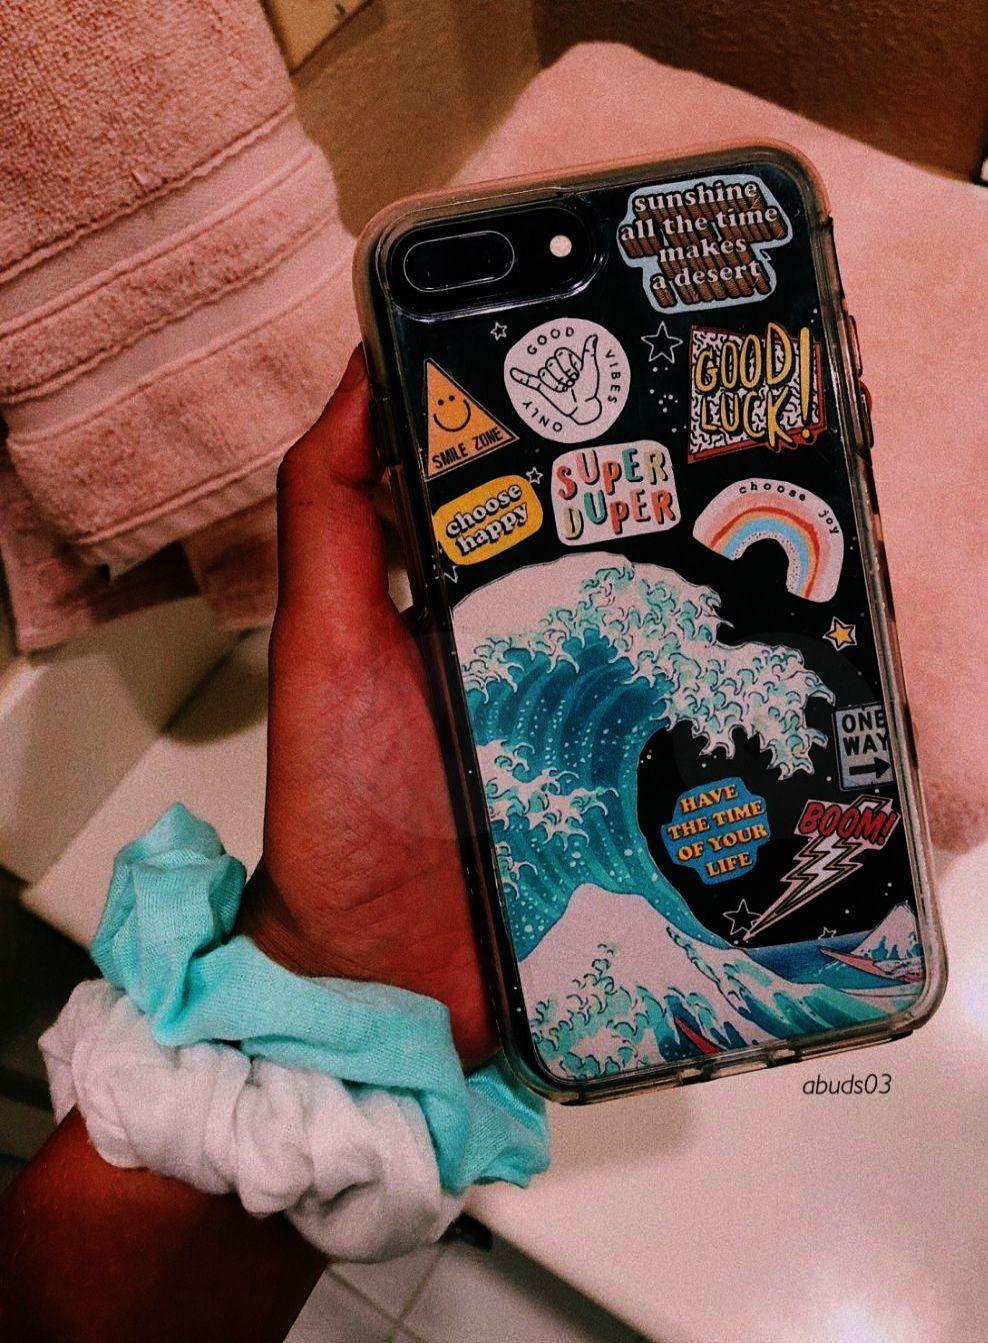 Gadgets deals next iphone xr cases in walmart case iphone